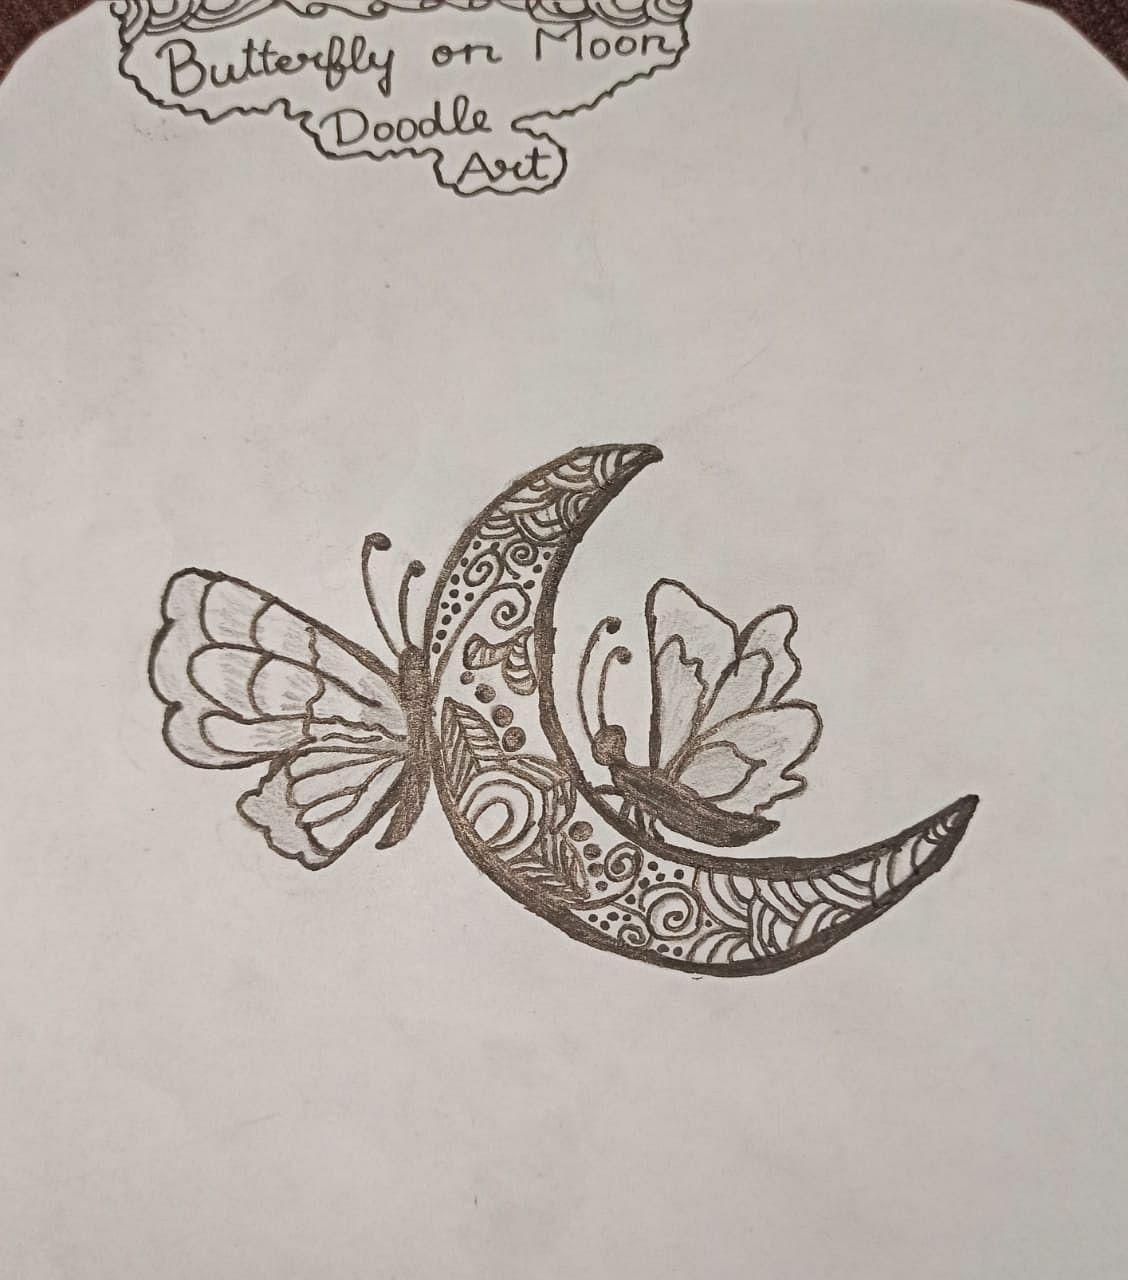 Butterfly on moon